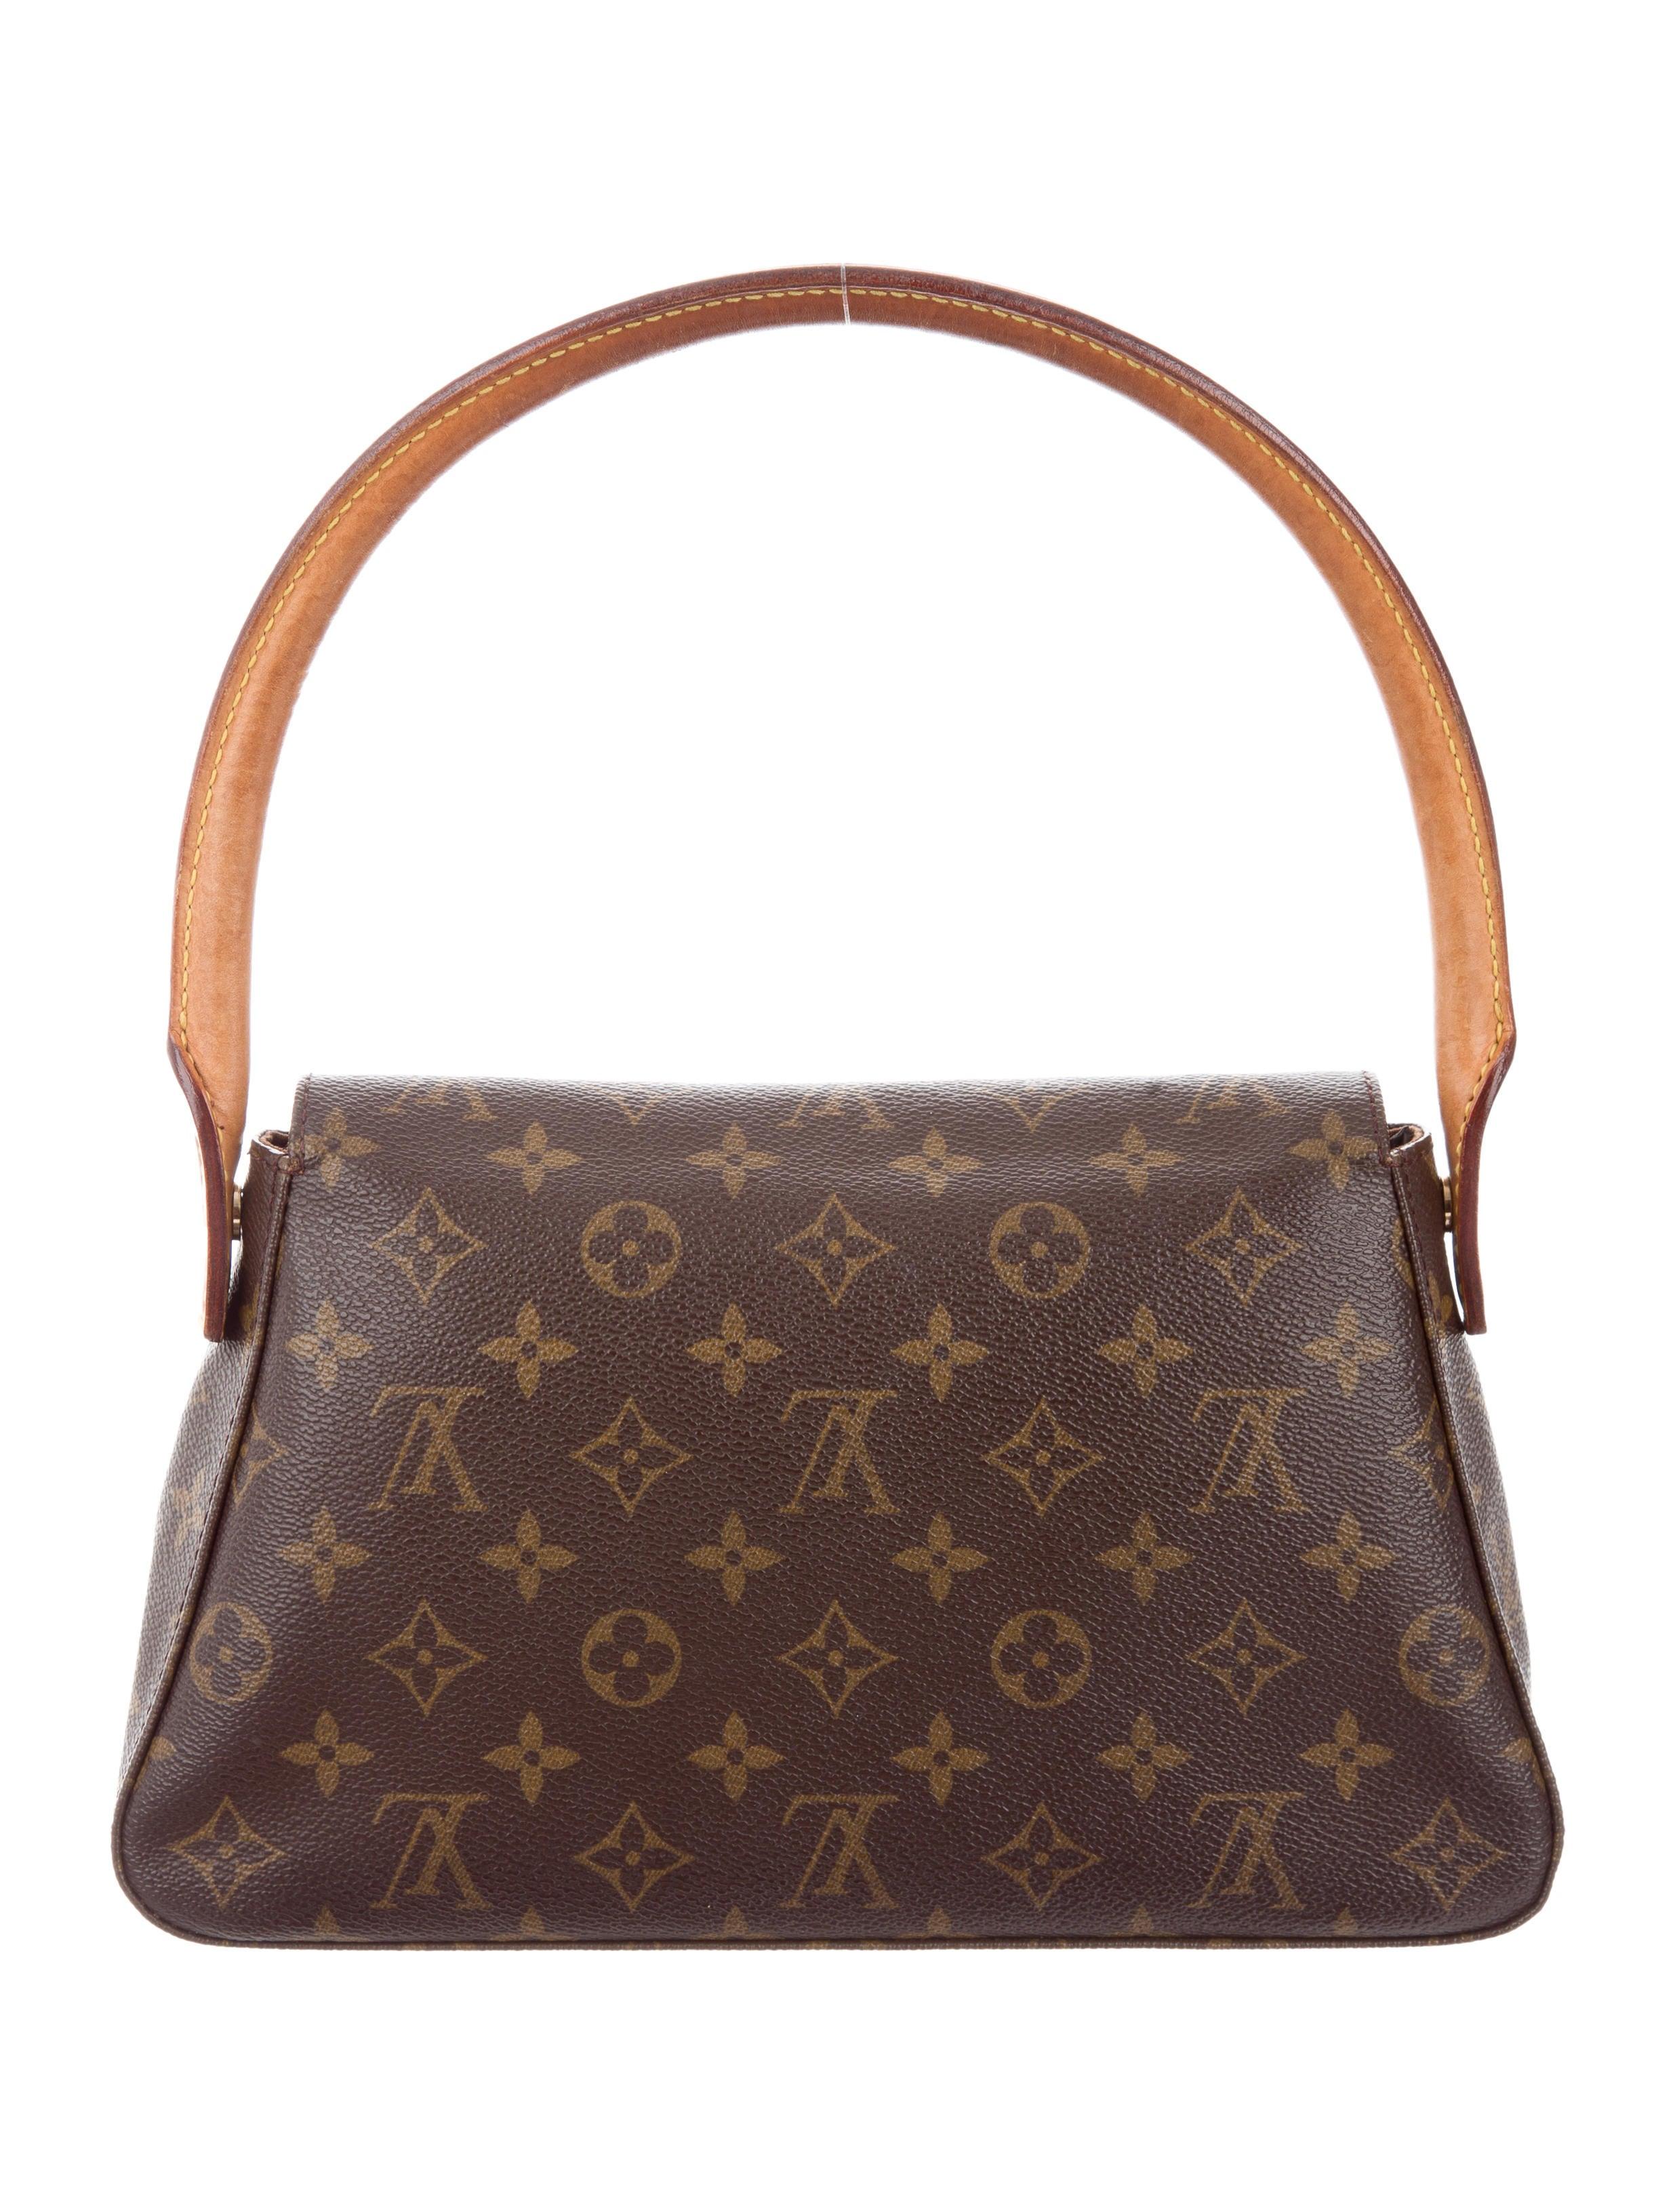 Louis vuitton monogram mini looping bag handbags for Louis vuitton miroir bags